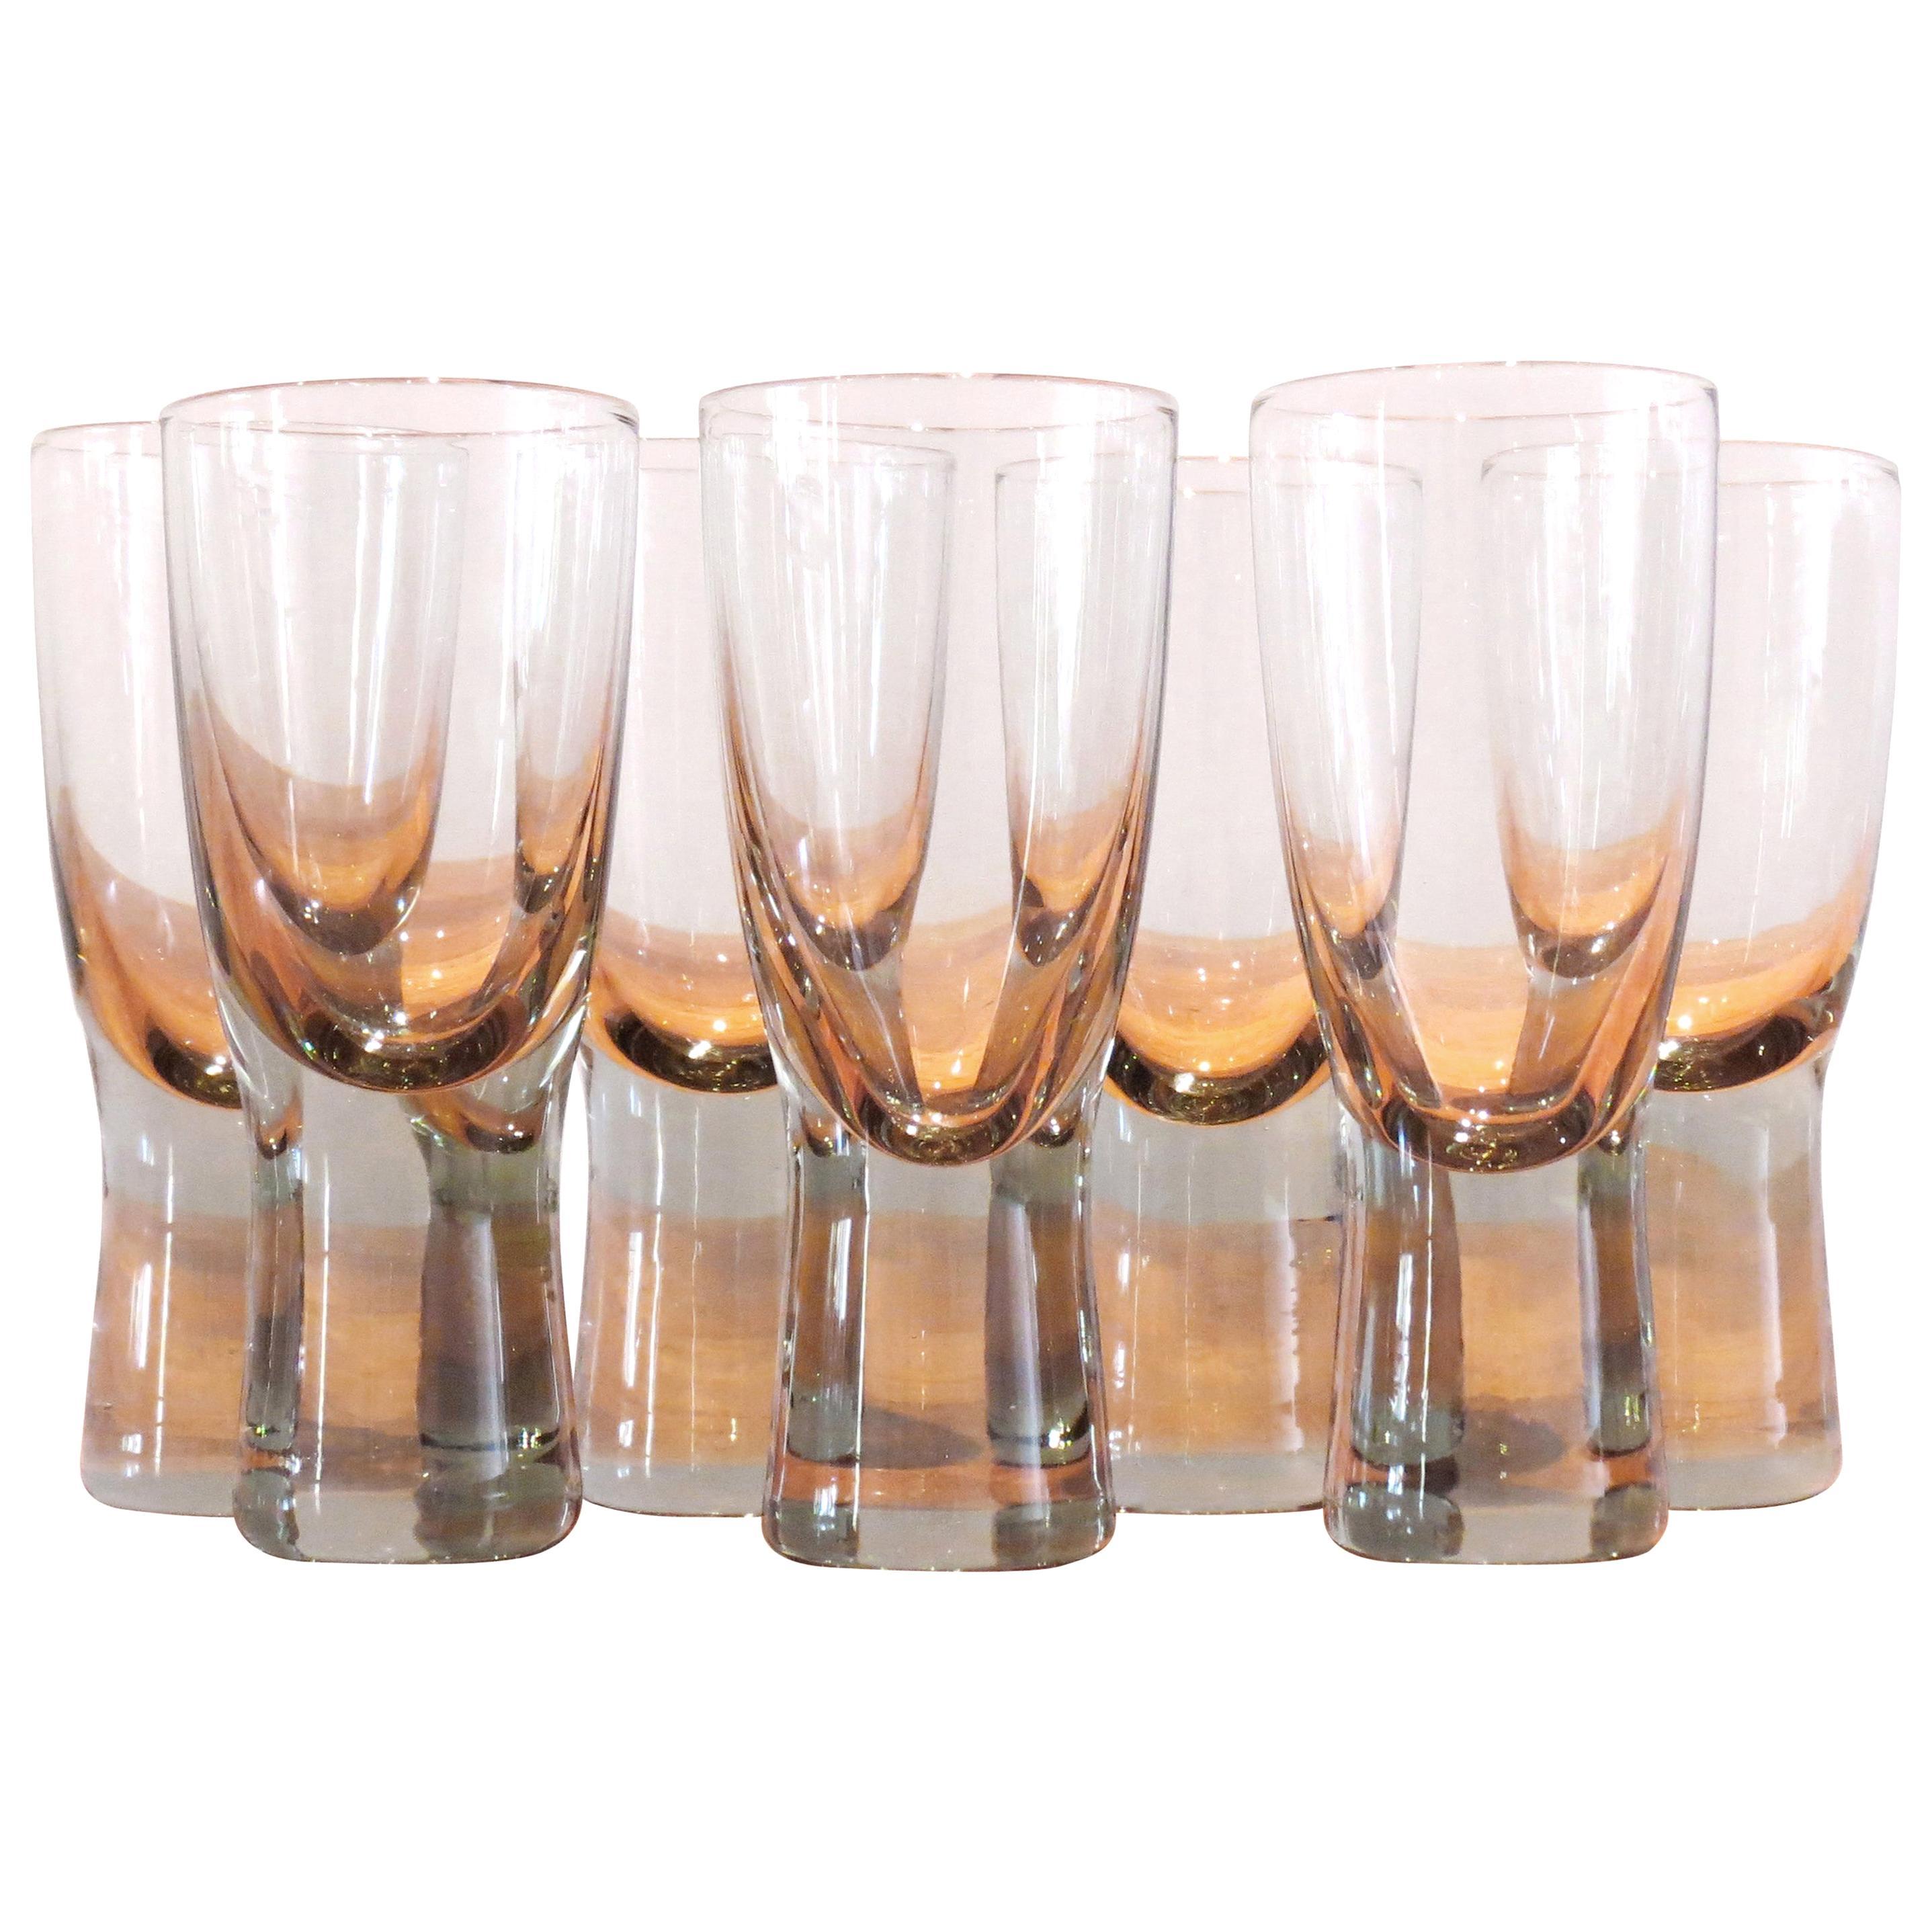 Set of Seven Holmegaard Canada Wine Glasses by Per Lutken